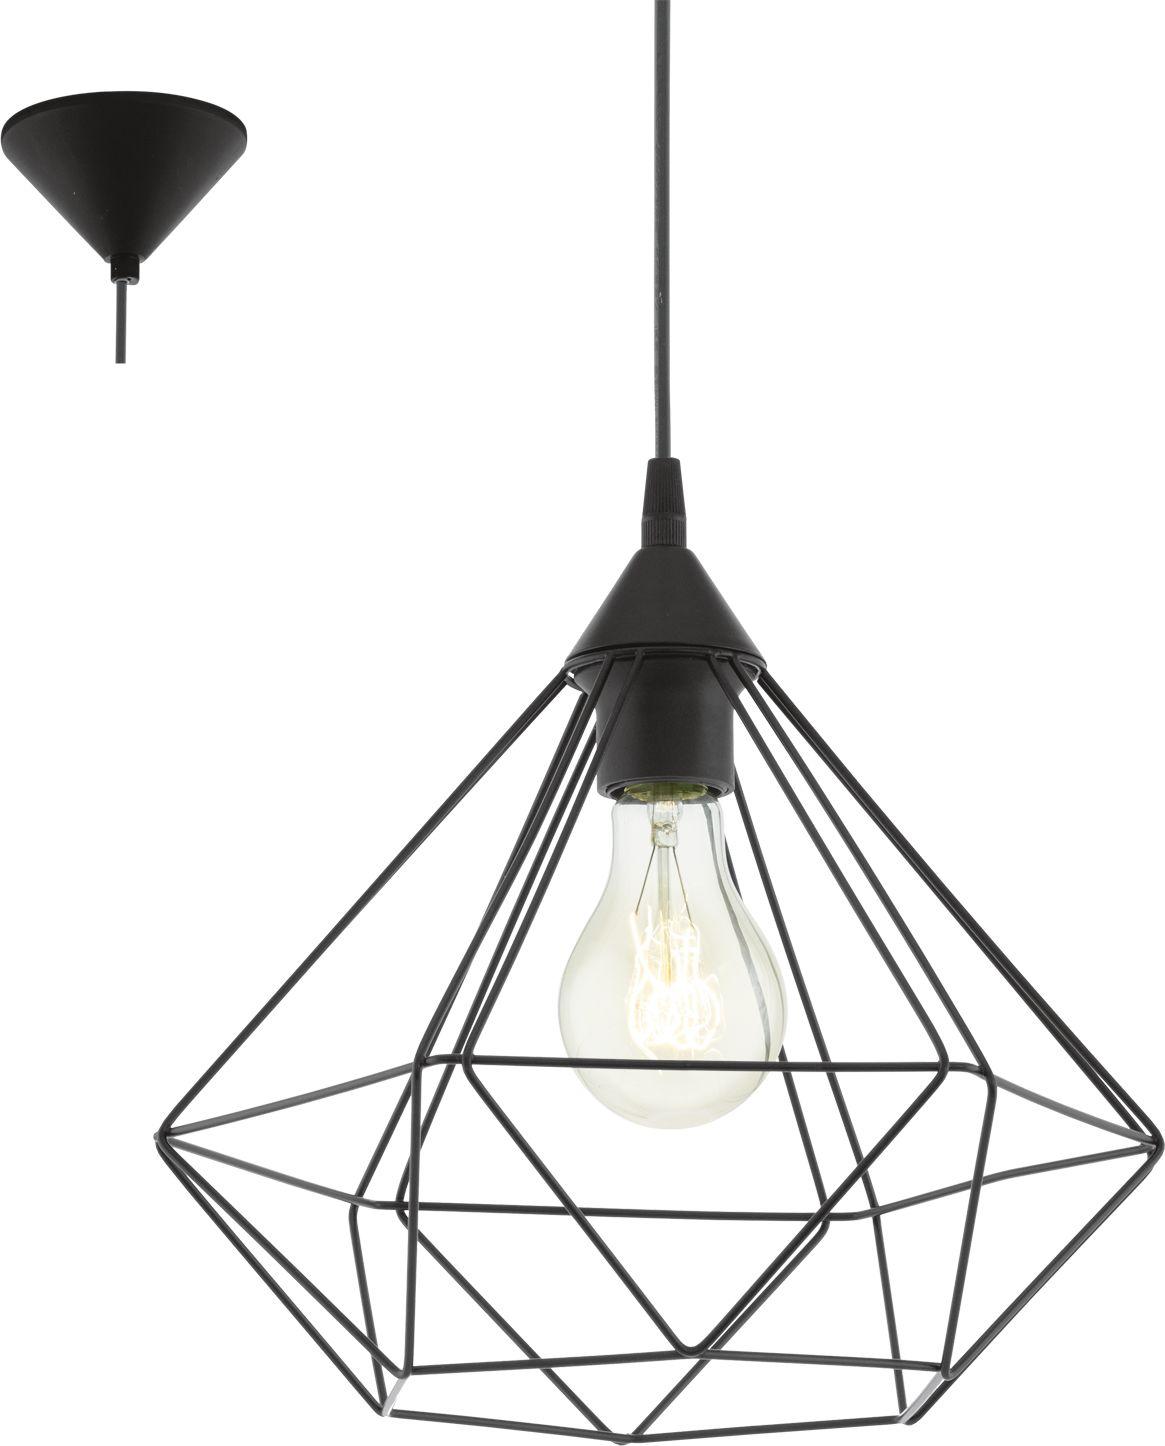 Eglo lampa wisząca Tarbes 94188 - SUPER OFERTA - RABAT w koszyku / 24h